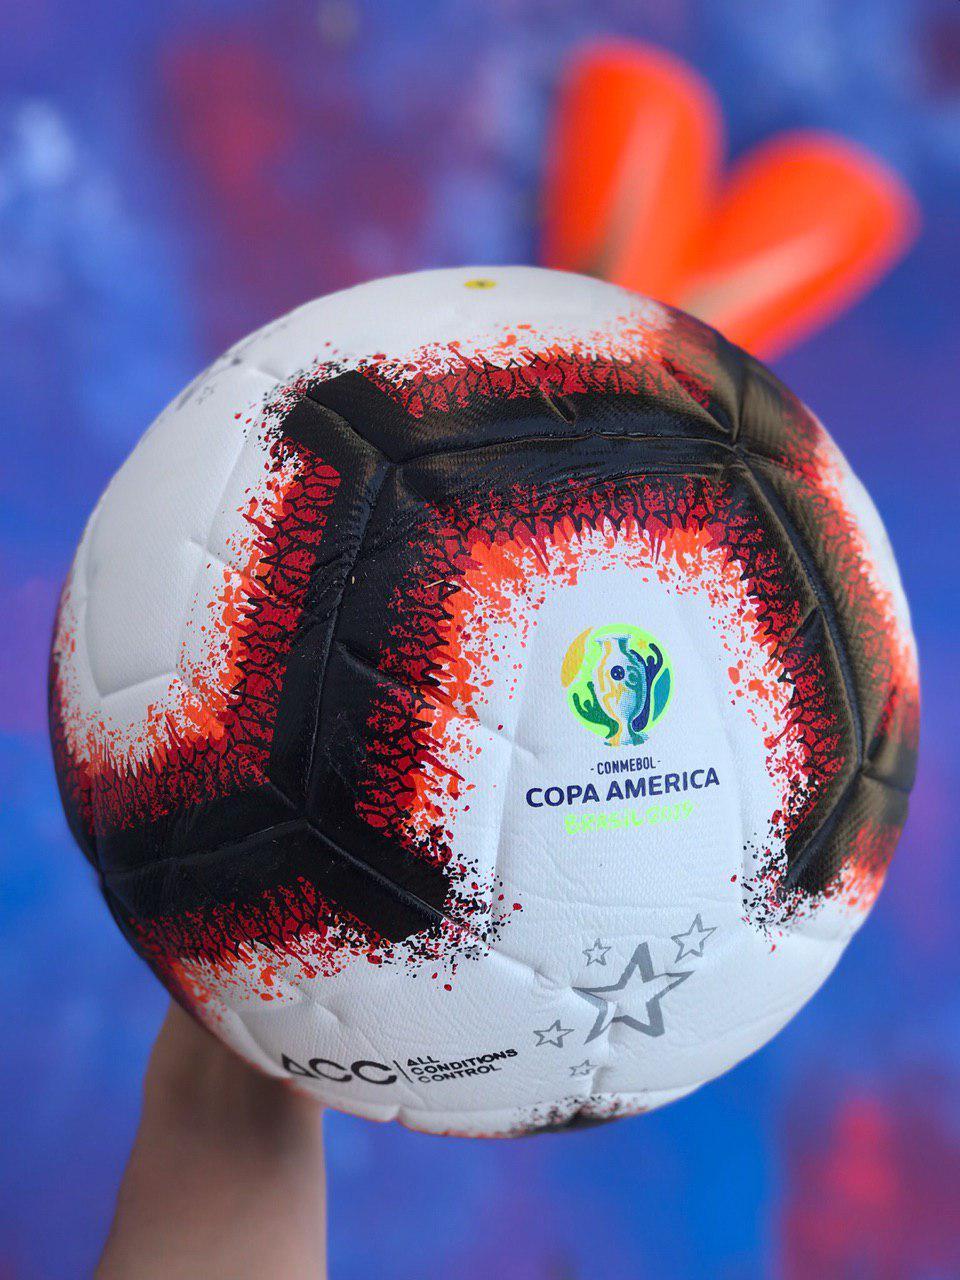 Футбольний м'яч Nike Strike Rabisco Copa America 2019 /копа америка